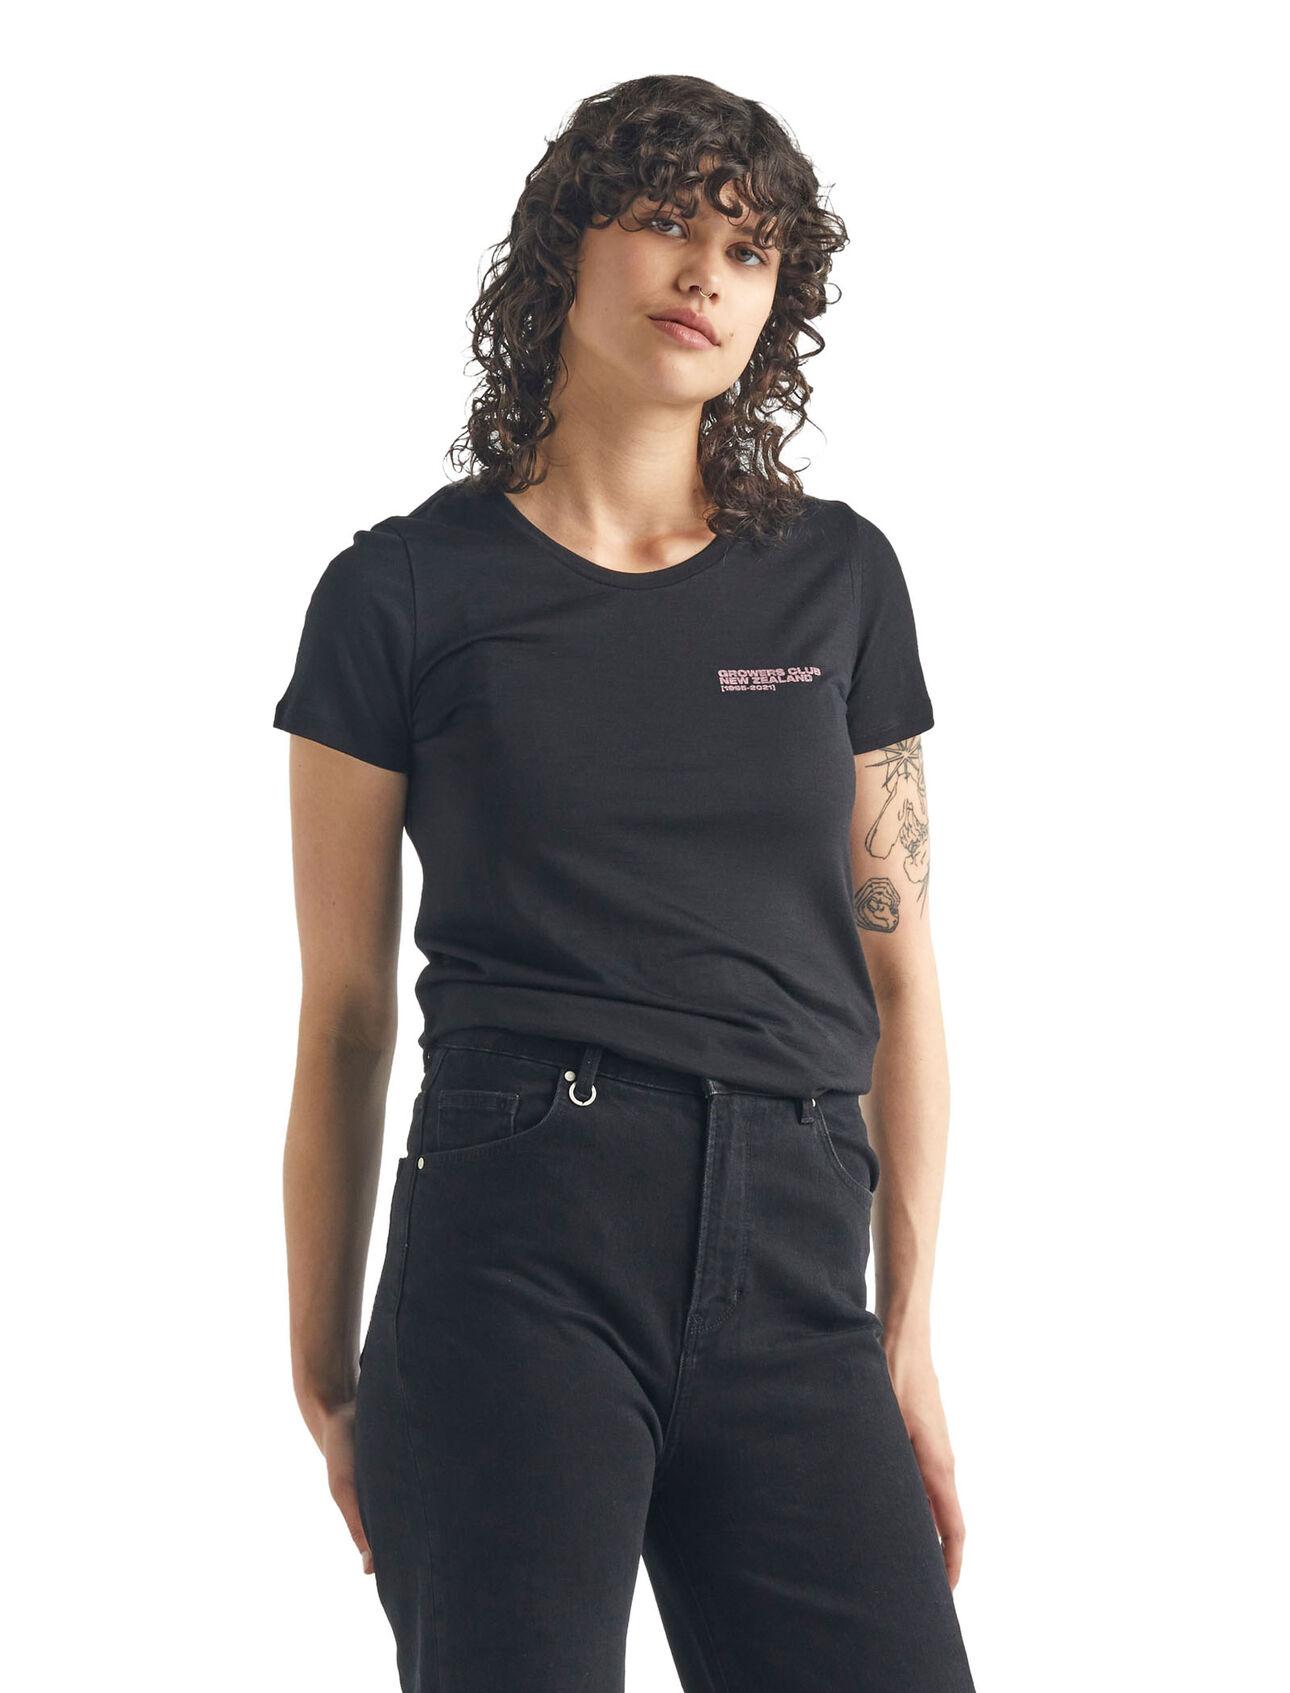 Merino Tech Lite Short Sleeve Low Crewe T-Shirt Growers Club